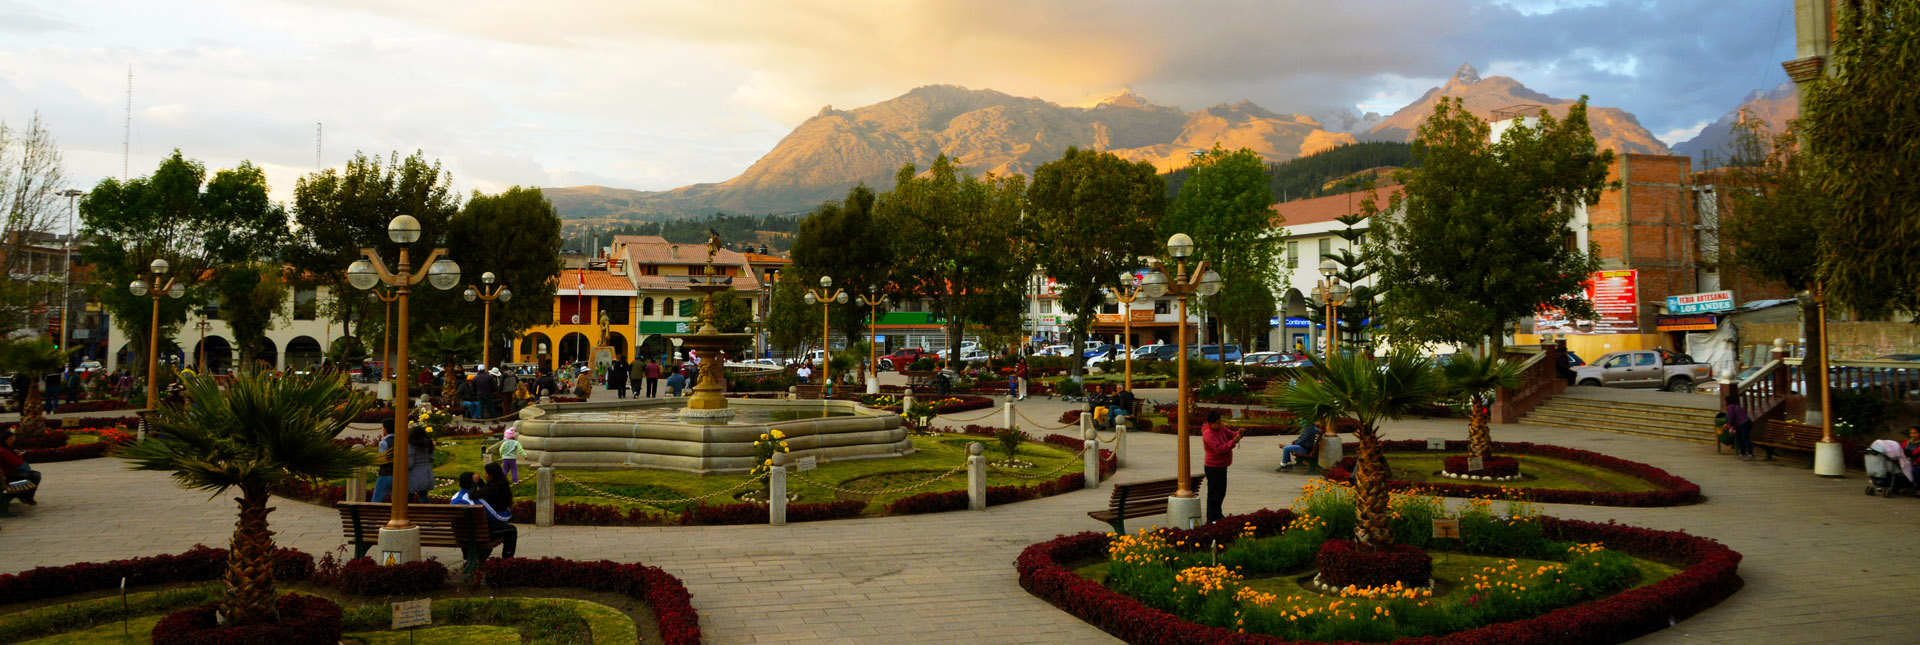 Huaraz, town center